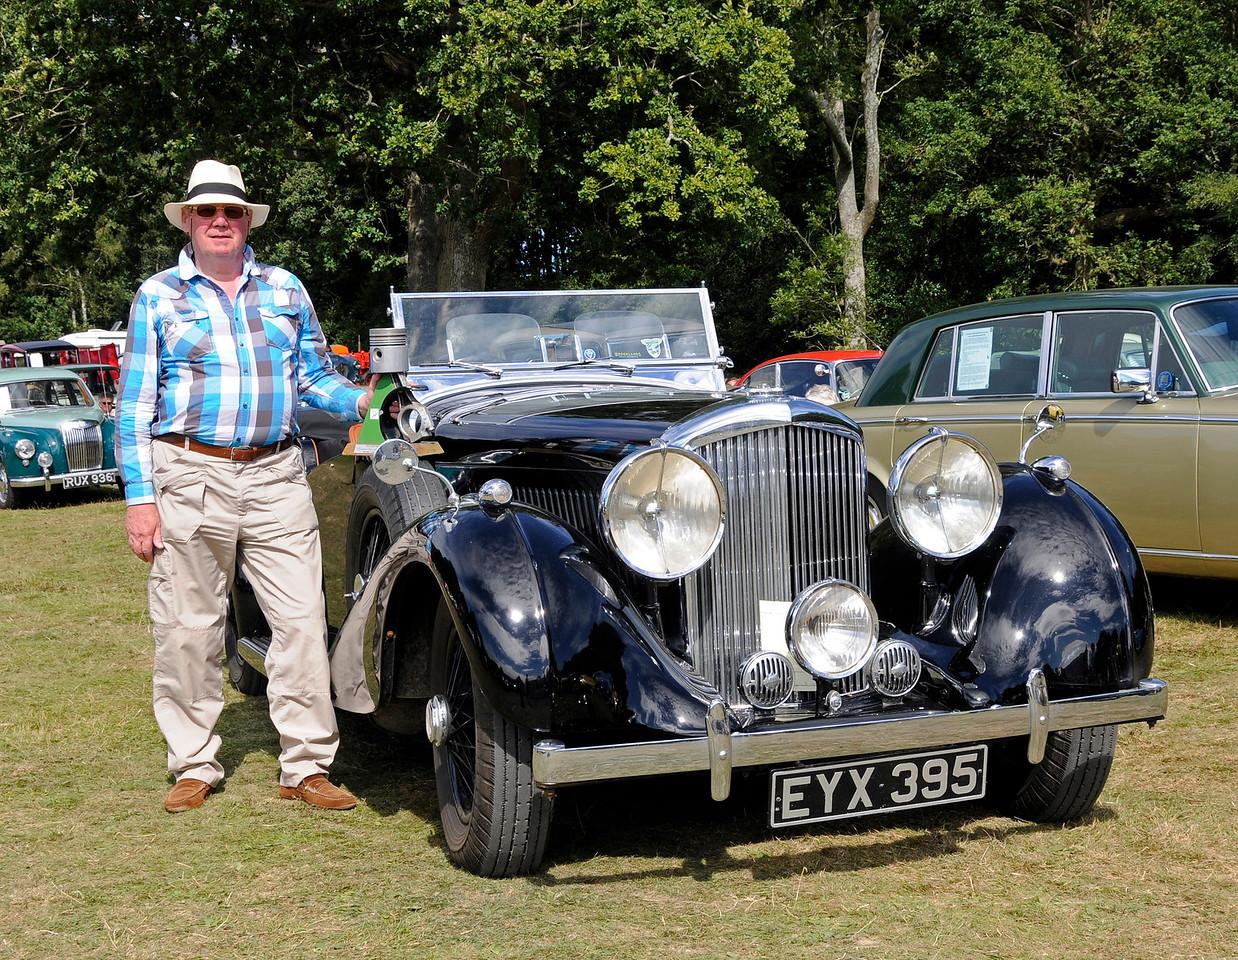 Best in Show winner Mike Ryan poses with his Bentley 4 1/4 Overdrive, EYX395.  Vintage Transport Weekend, Horsted Keynes.  09.08.2015 13679